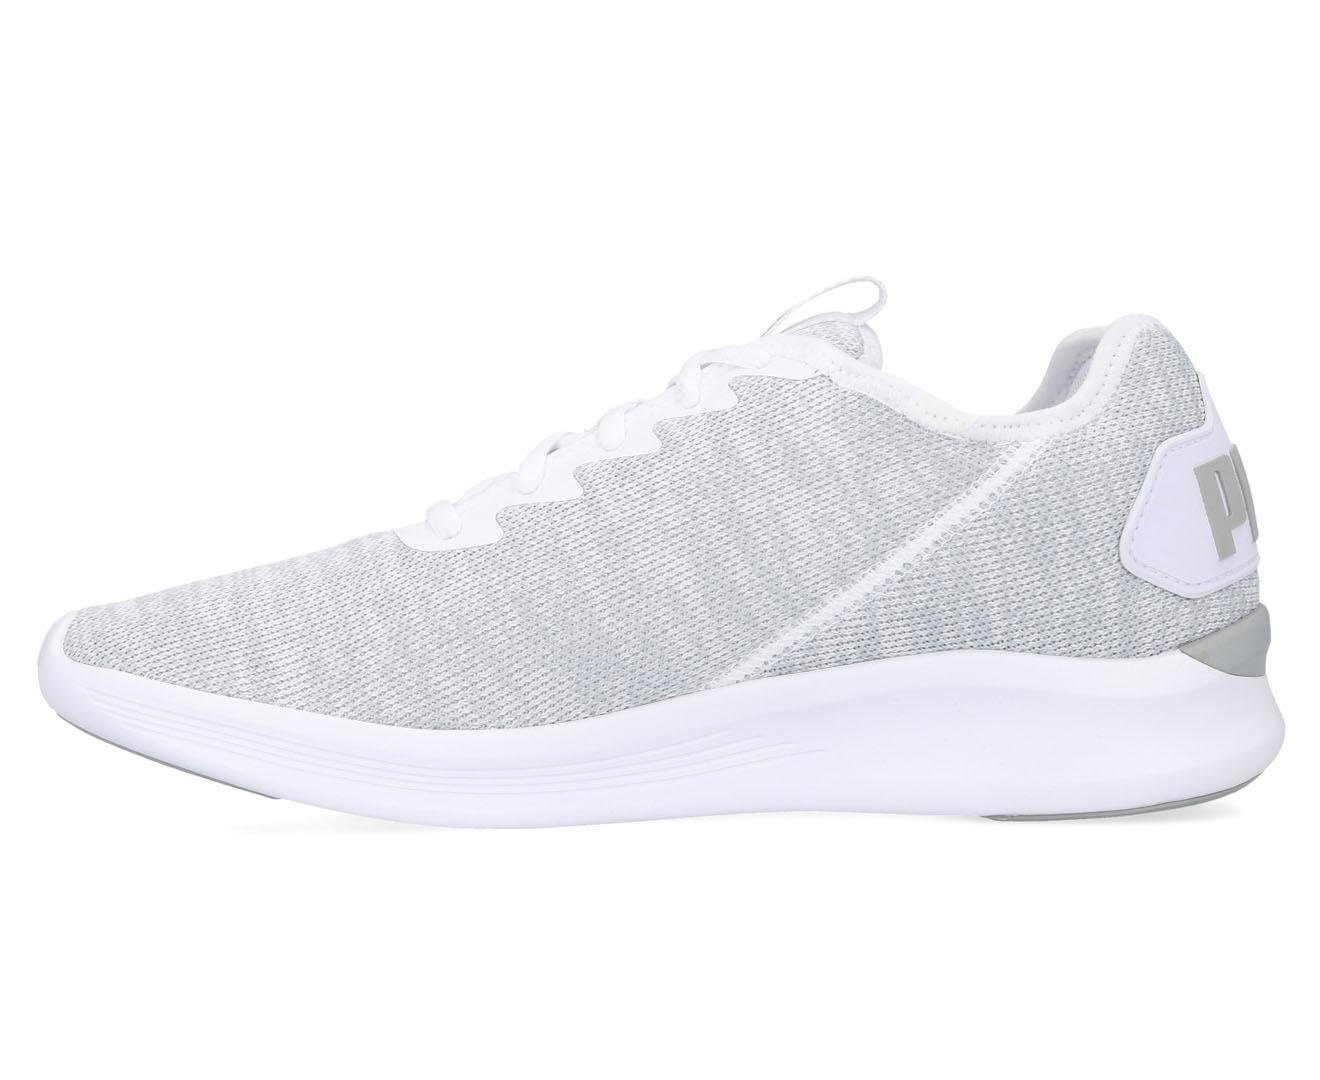 Puma Men's Ballast Running Shoes WhiteQuarry